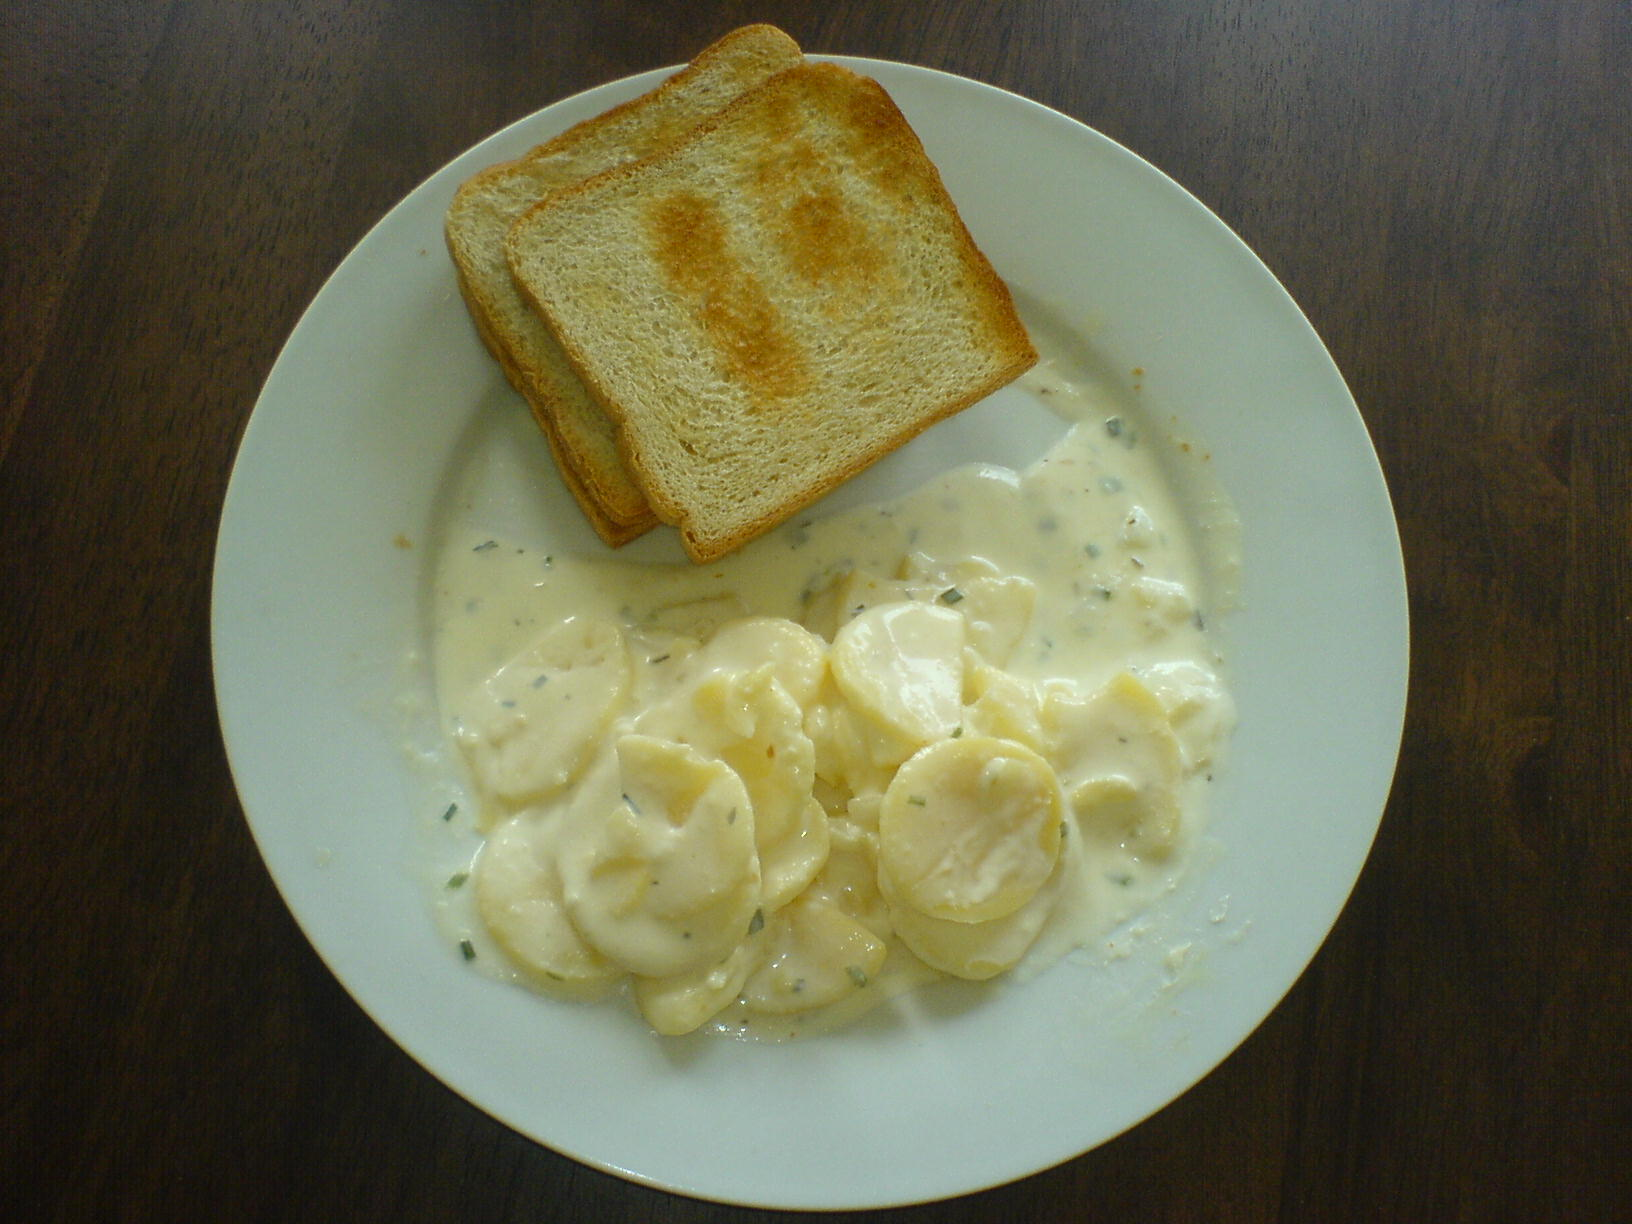 https://foodloader.net/Holz_2010-08-22_Kartoffelsalat_mit_Toasts.jpg